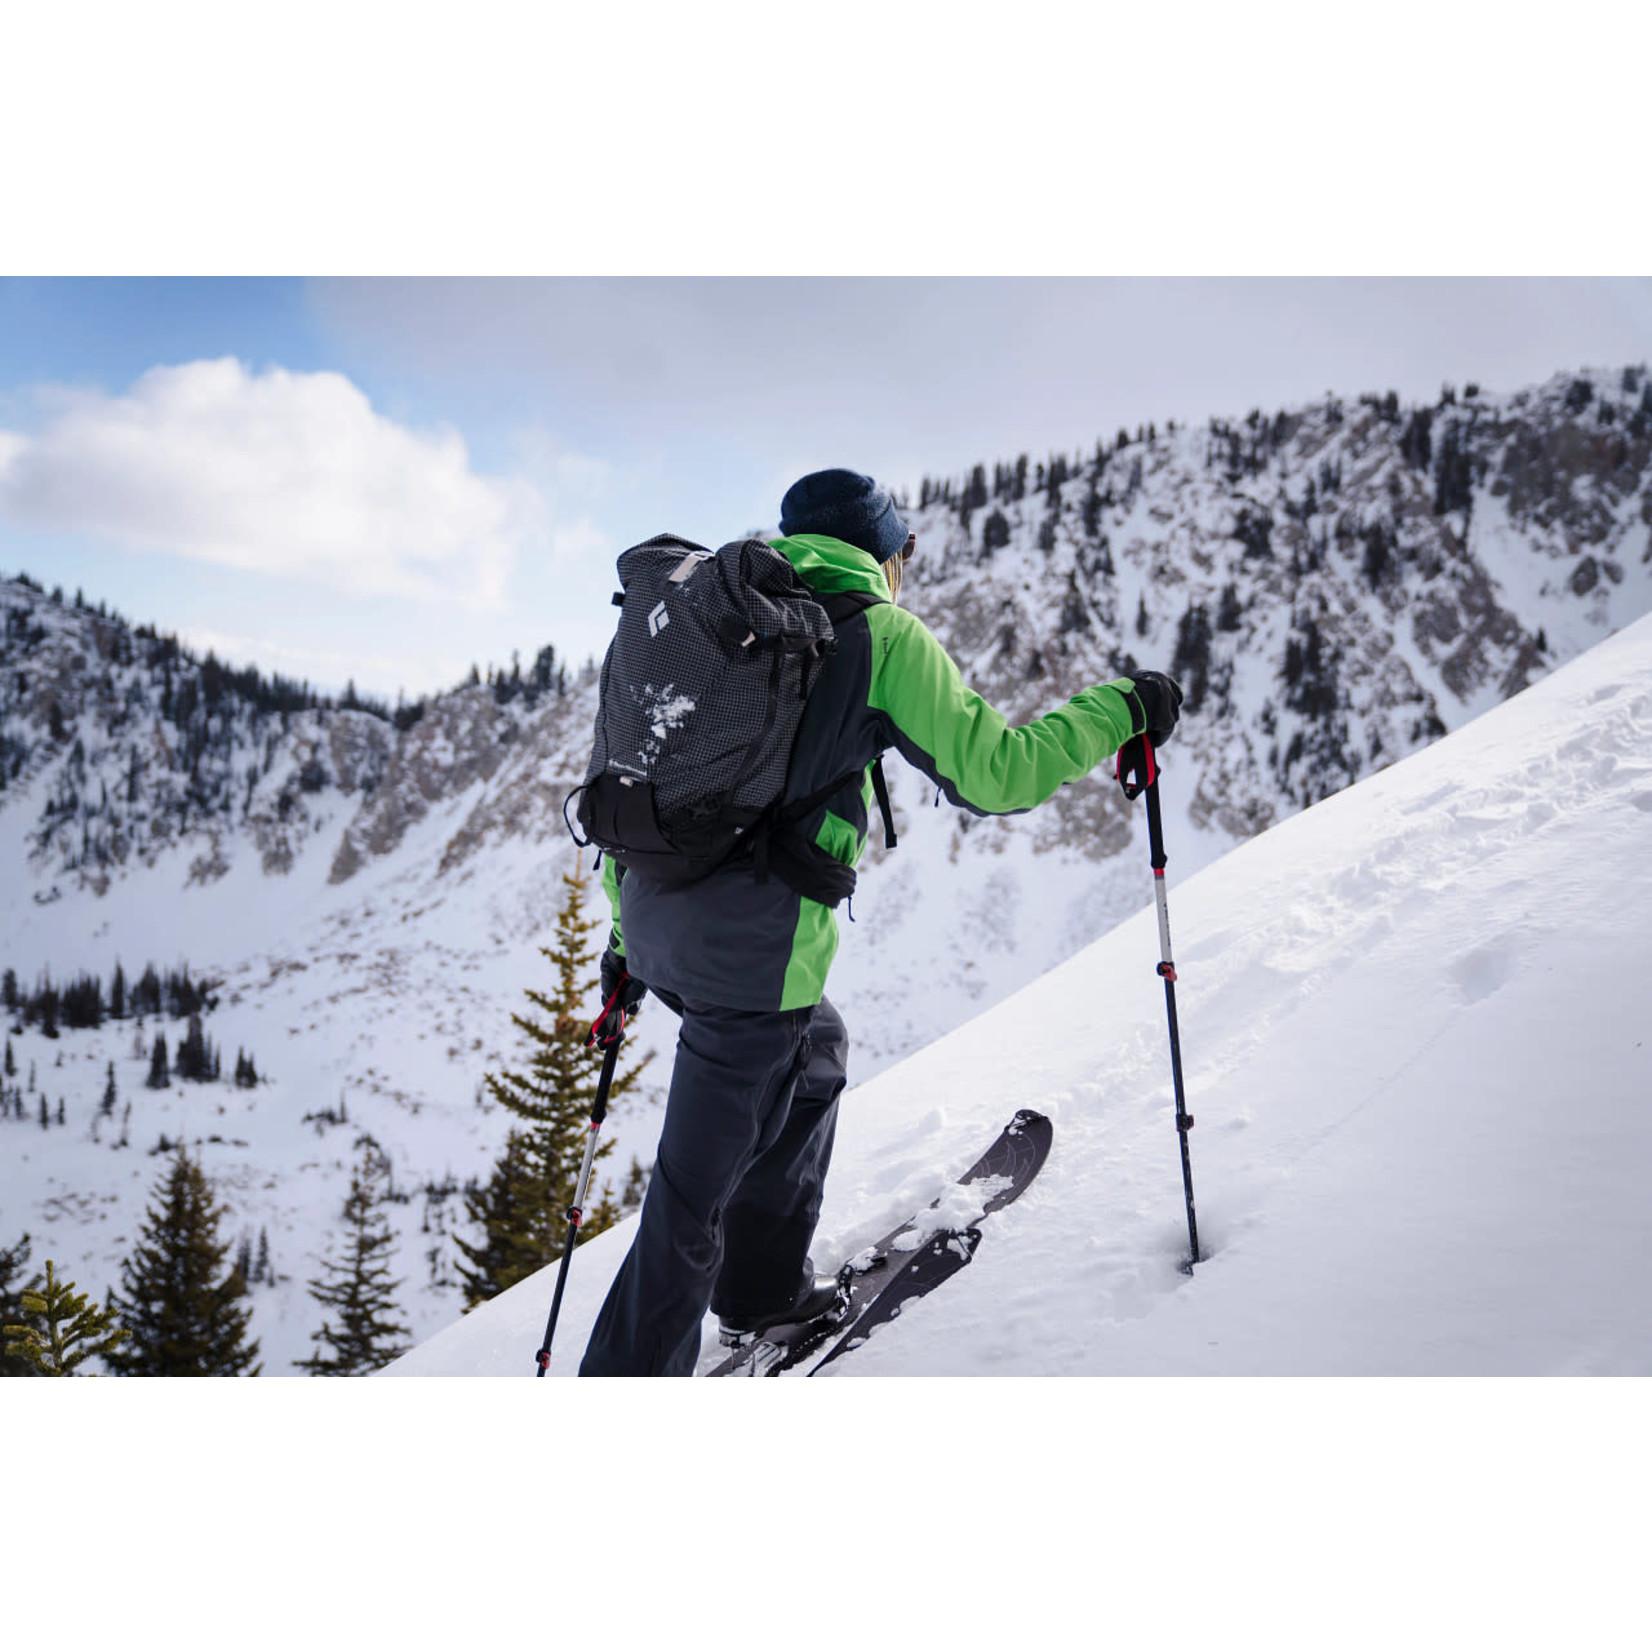 BD Impulse 104 Skis